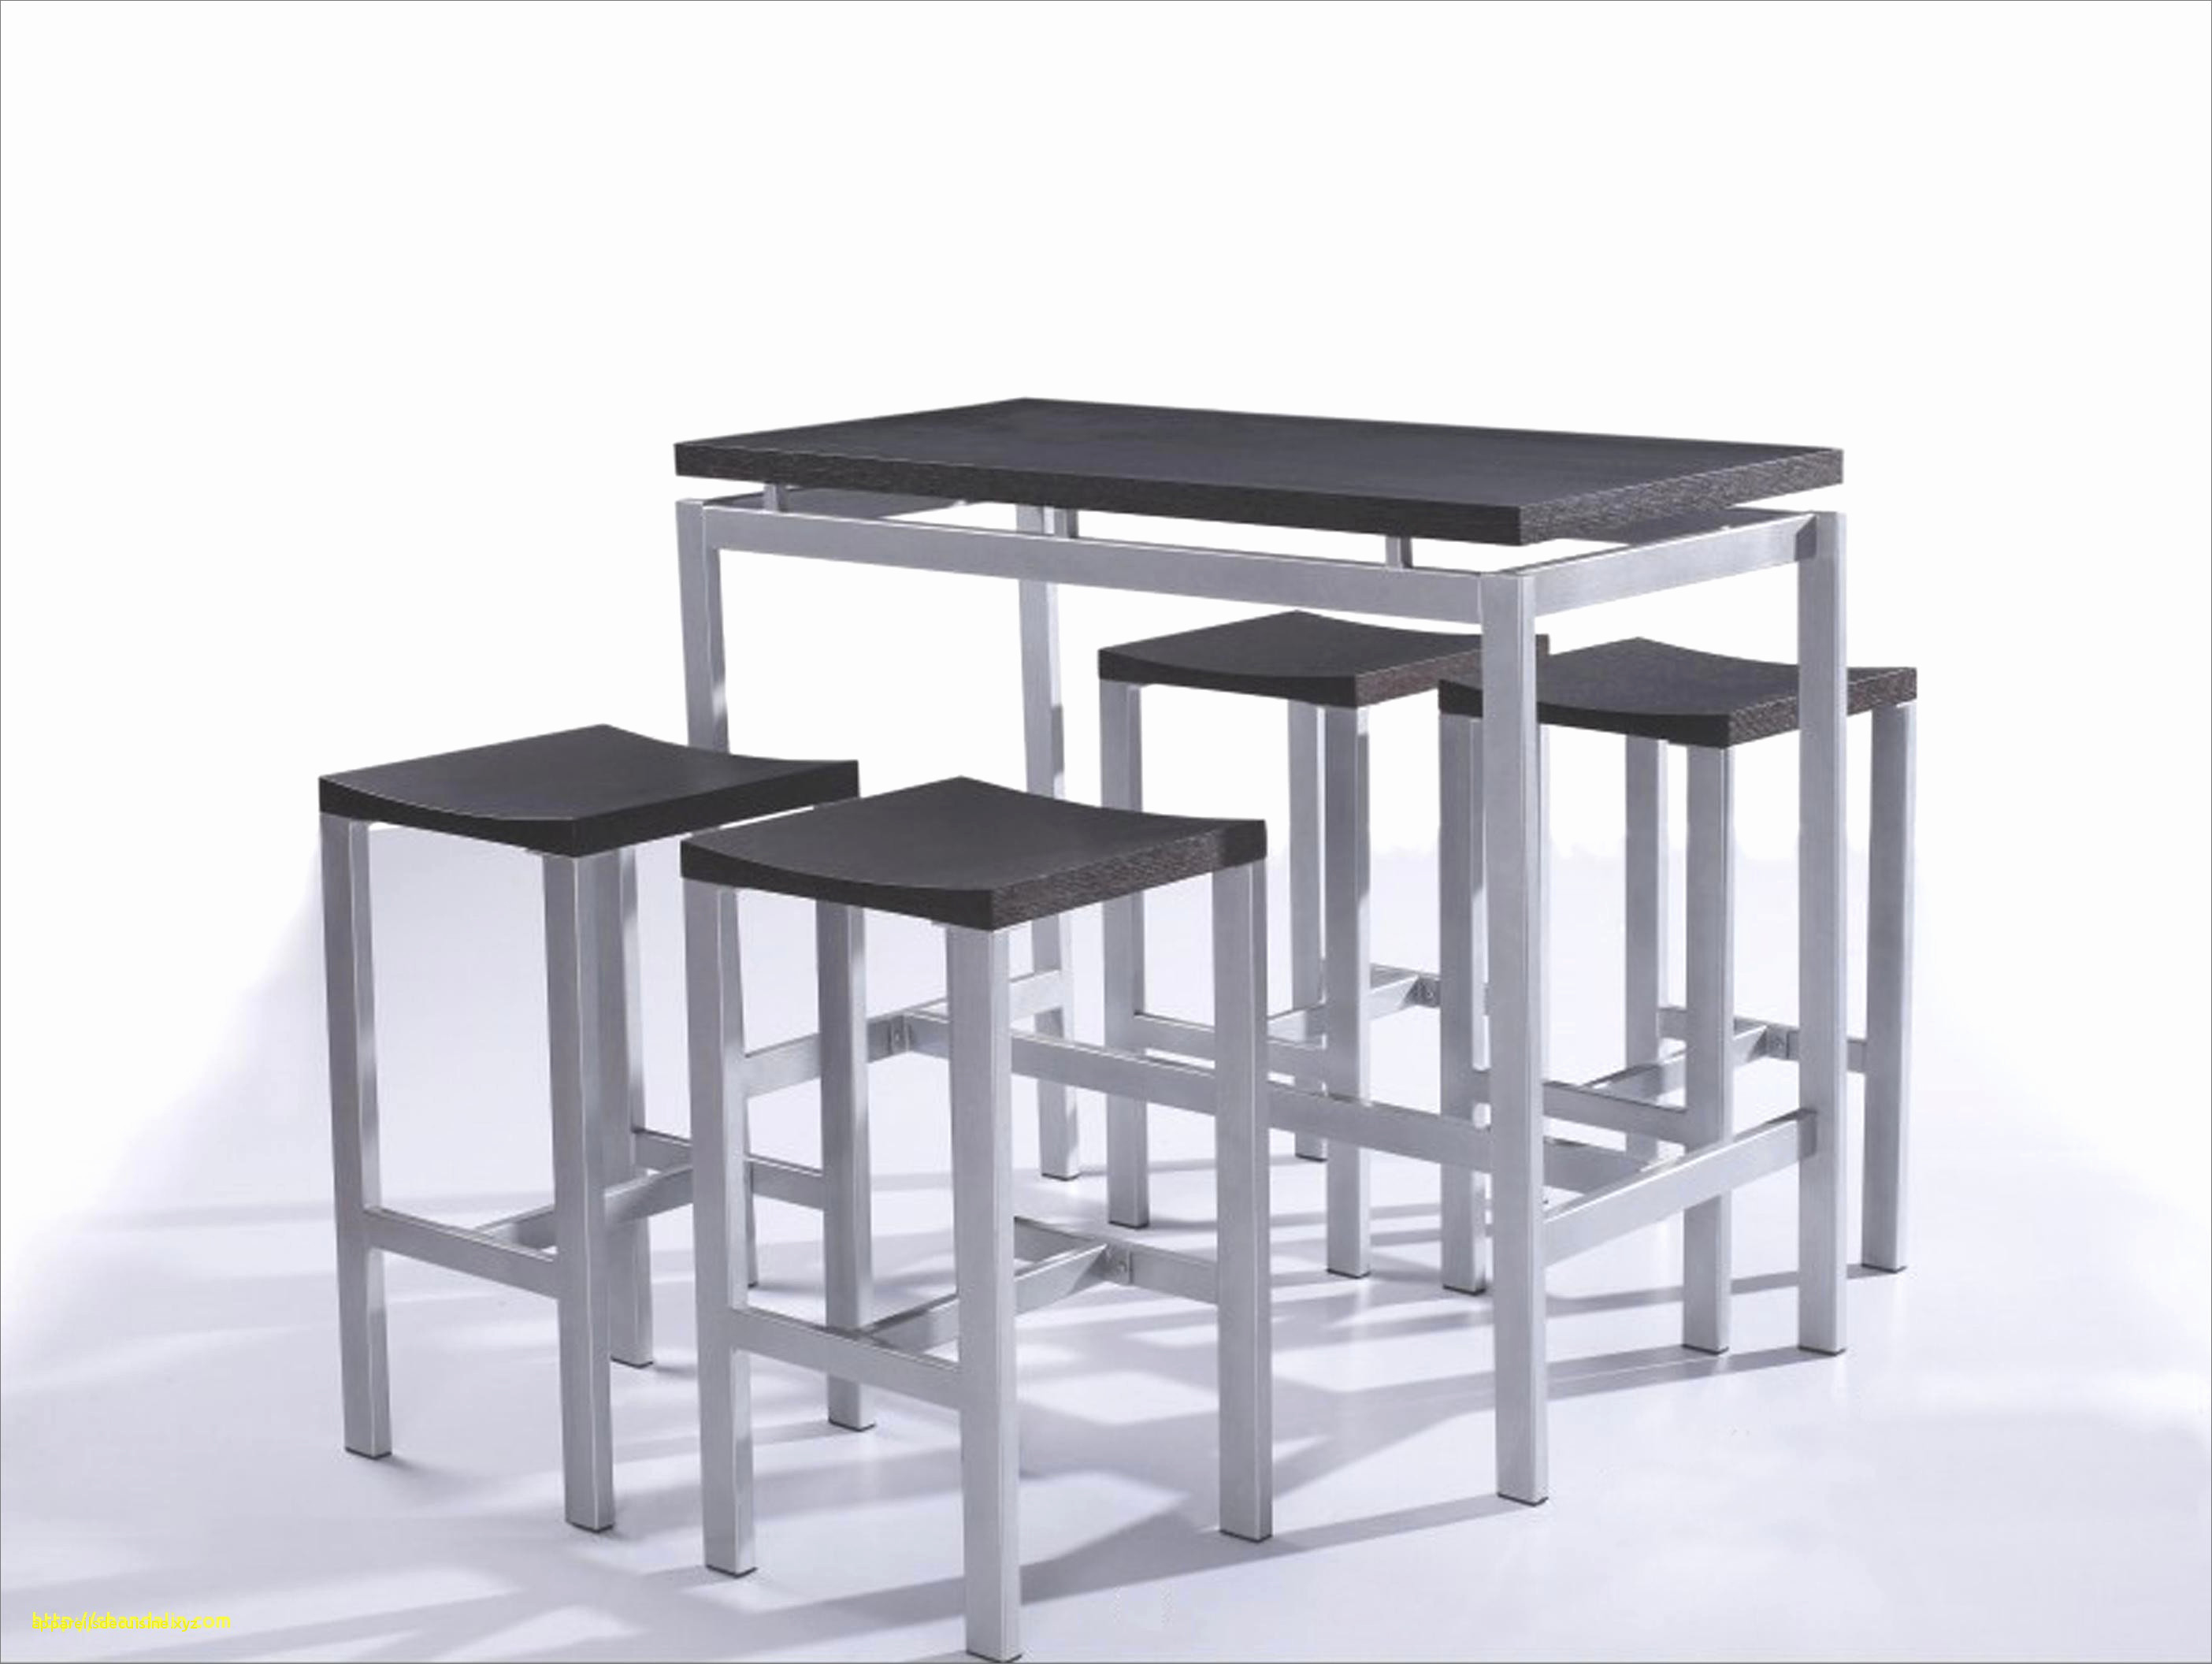 Conforama Boulogne Billancourt Luxe Photos Résultat Supérieur 61 Superbe Conforama Table Pliante S 2018